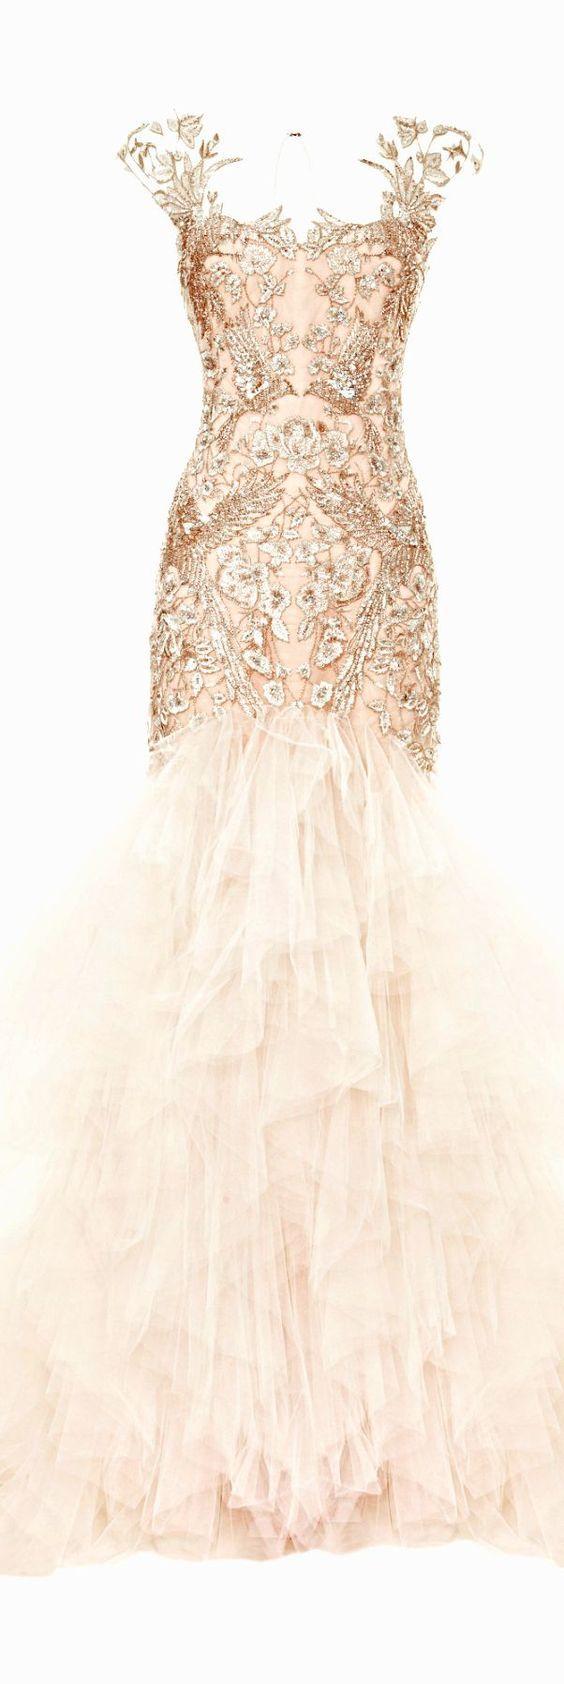 Metallic wedding dress  stunning embellished wedding gown  himisspuffrose